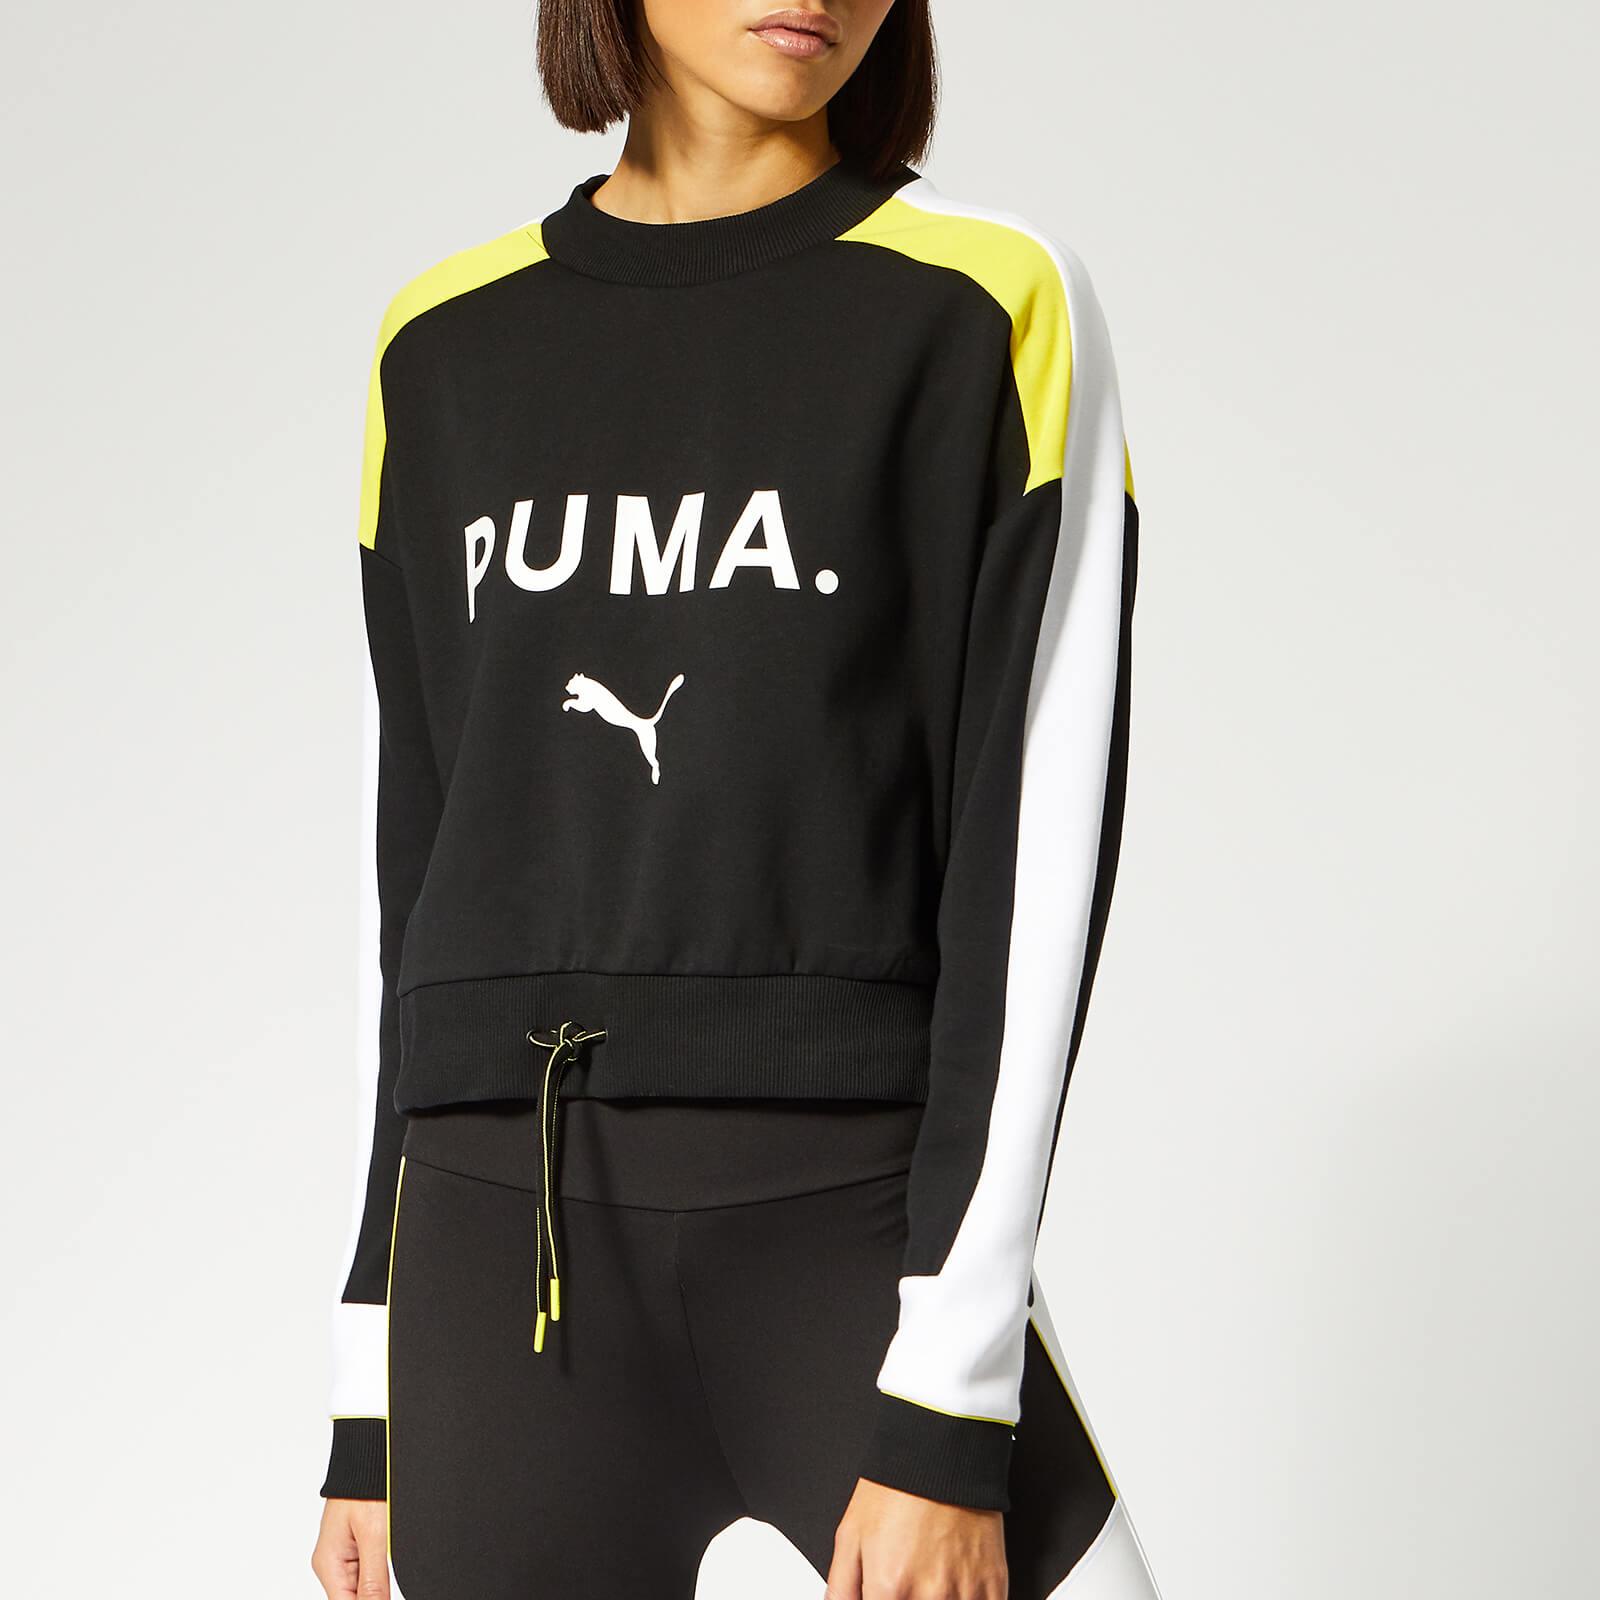 Puma Women's Chase Crew Neck Sweatshirt Cotton Black